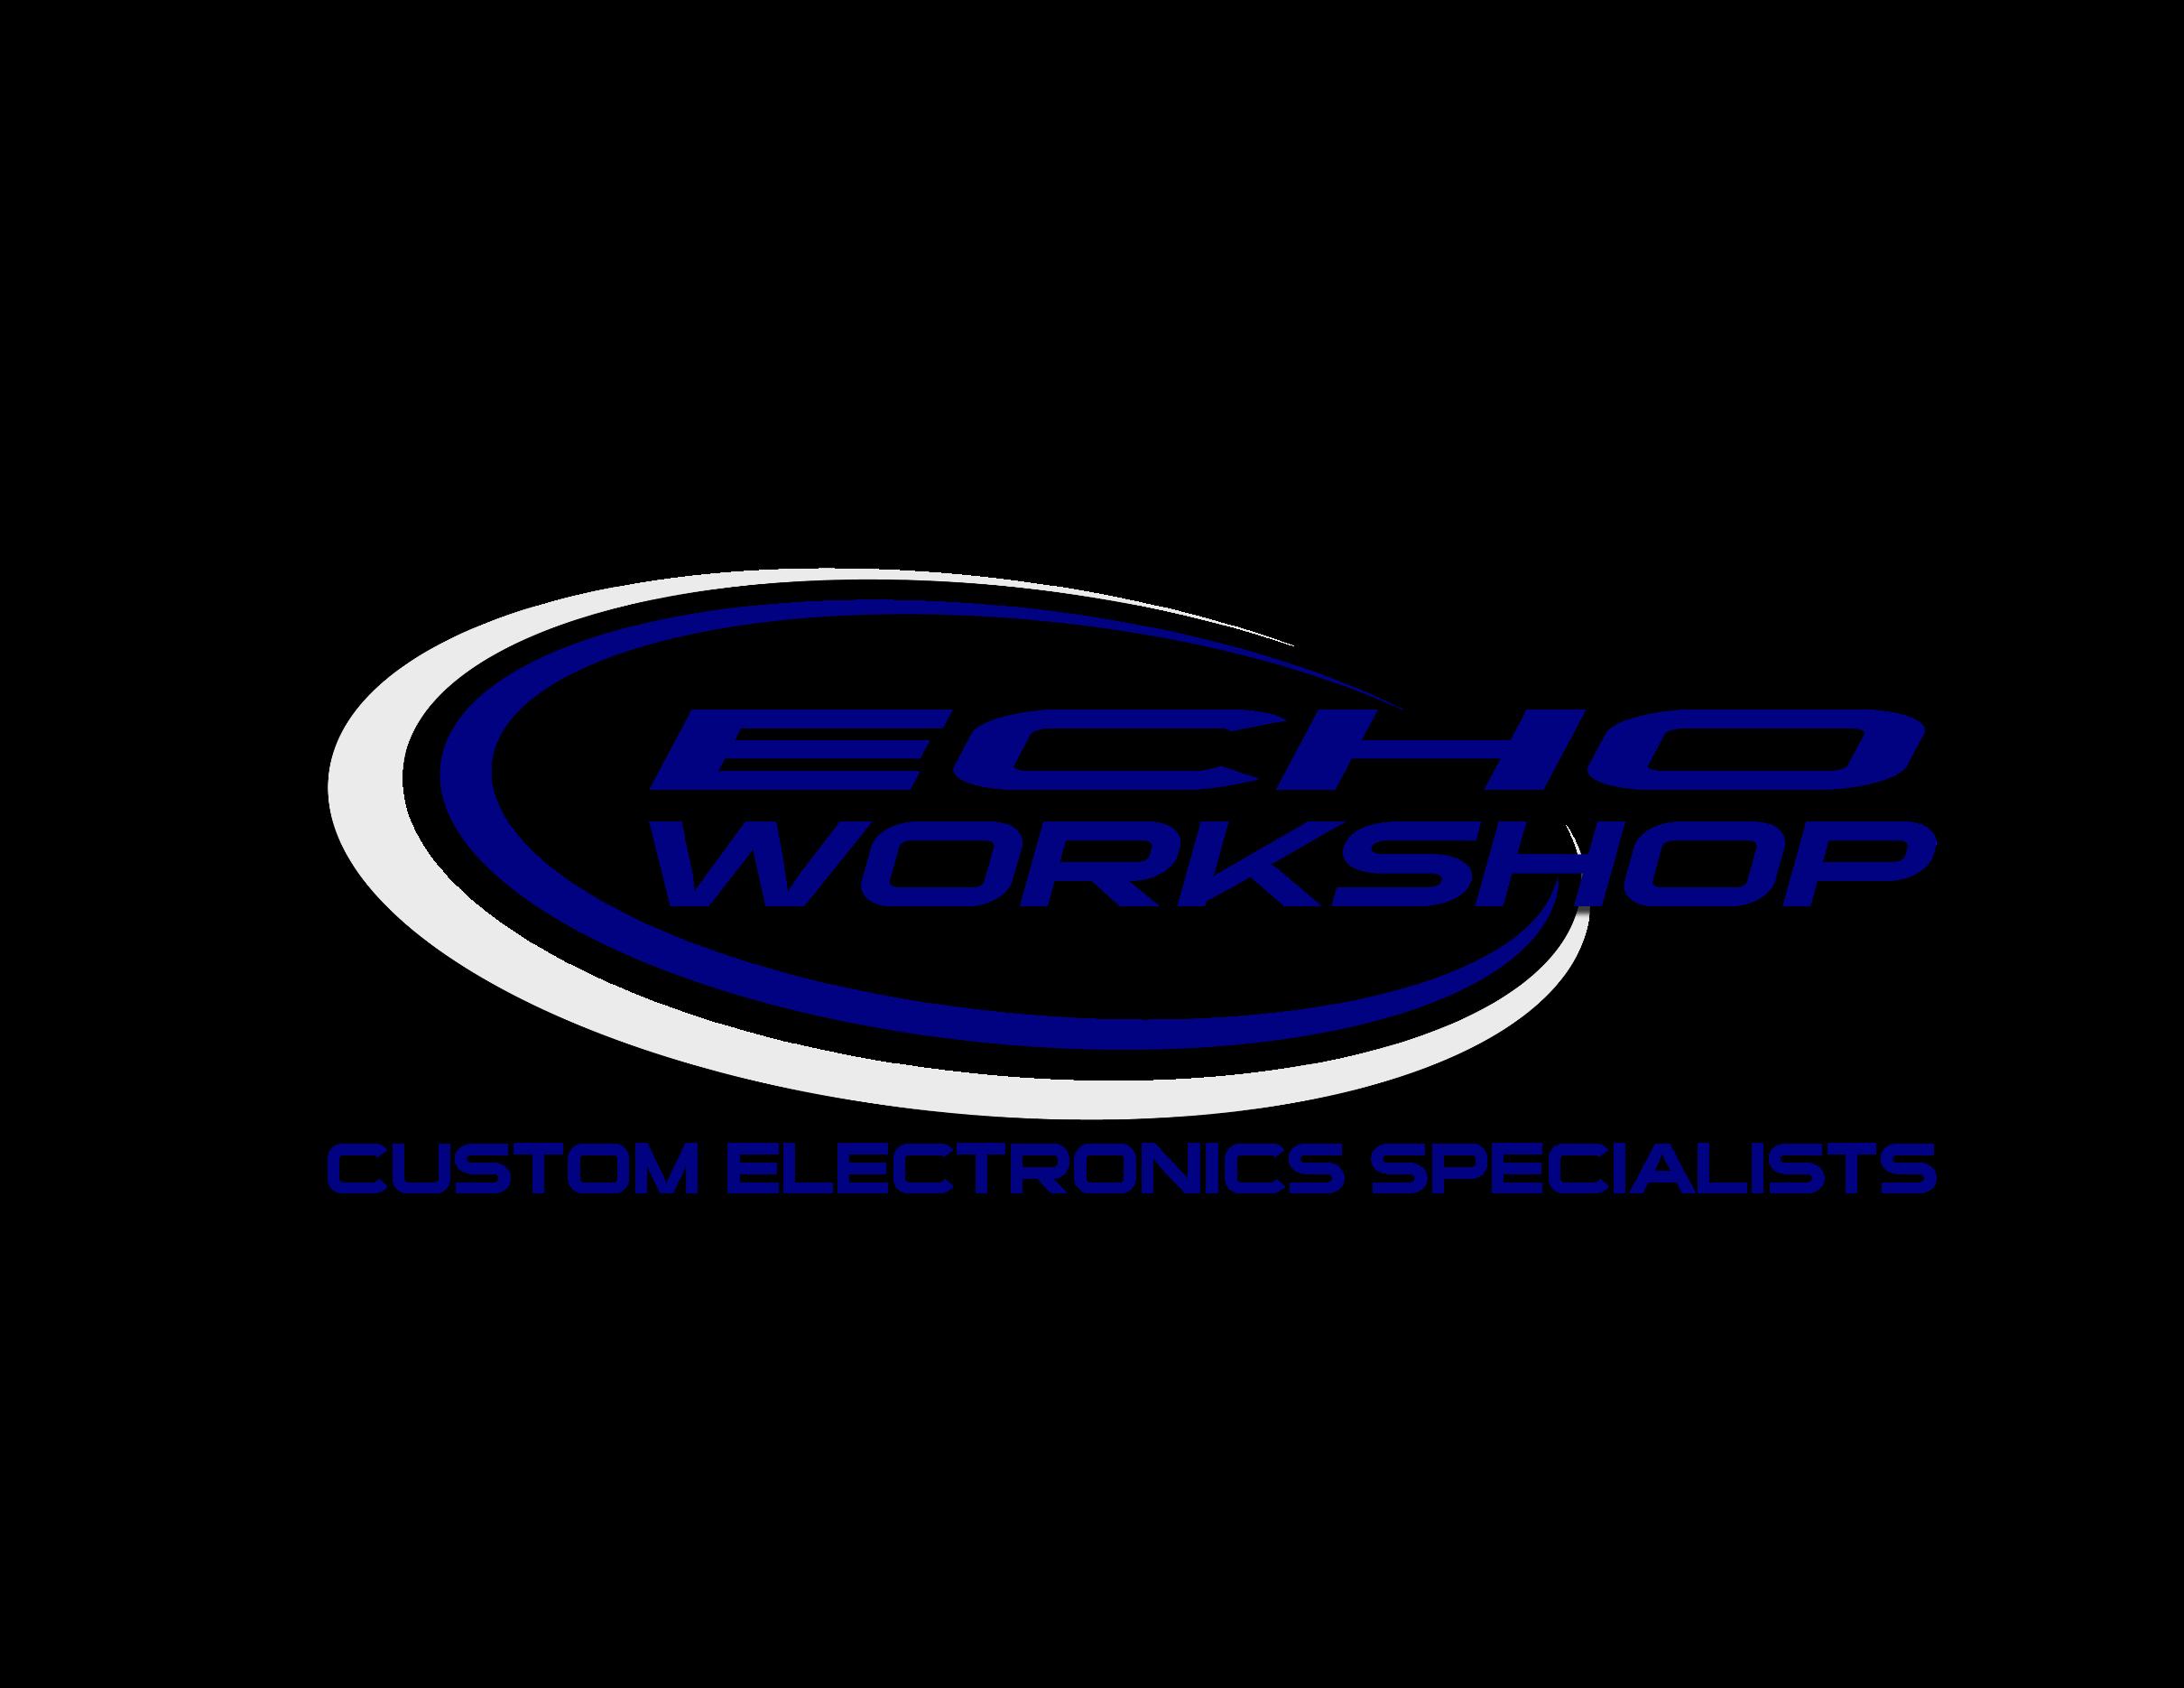 Echo Workshop